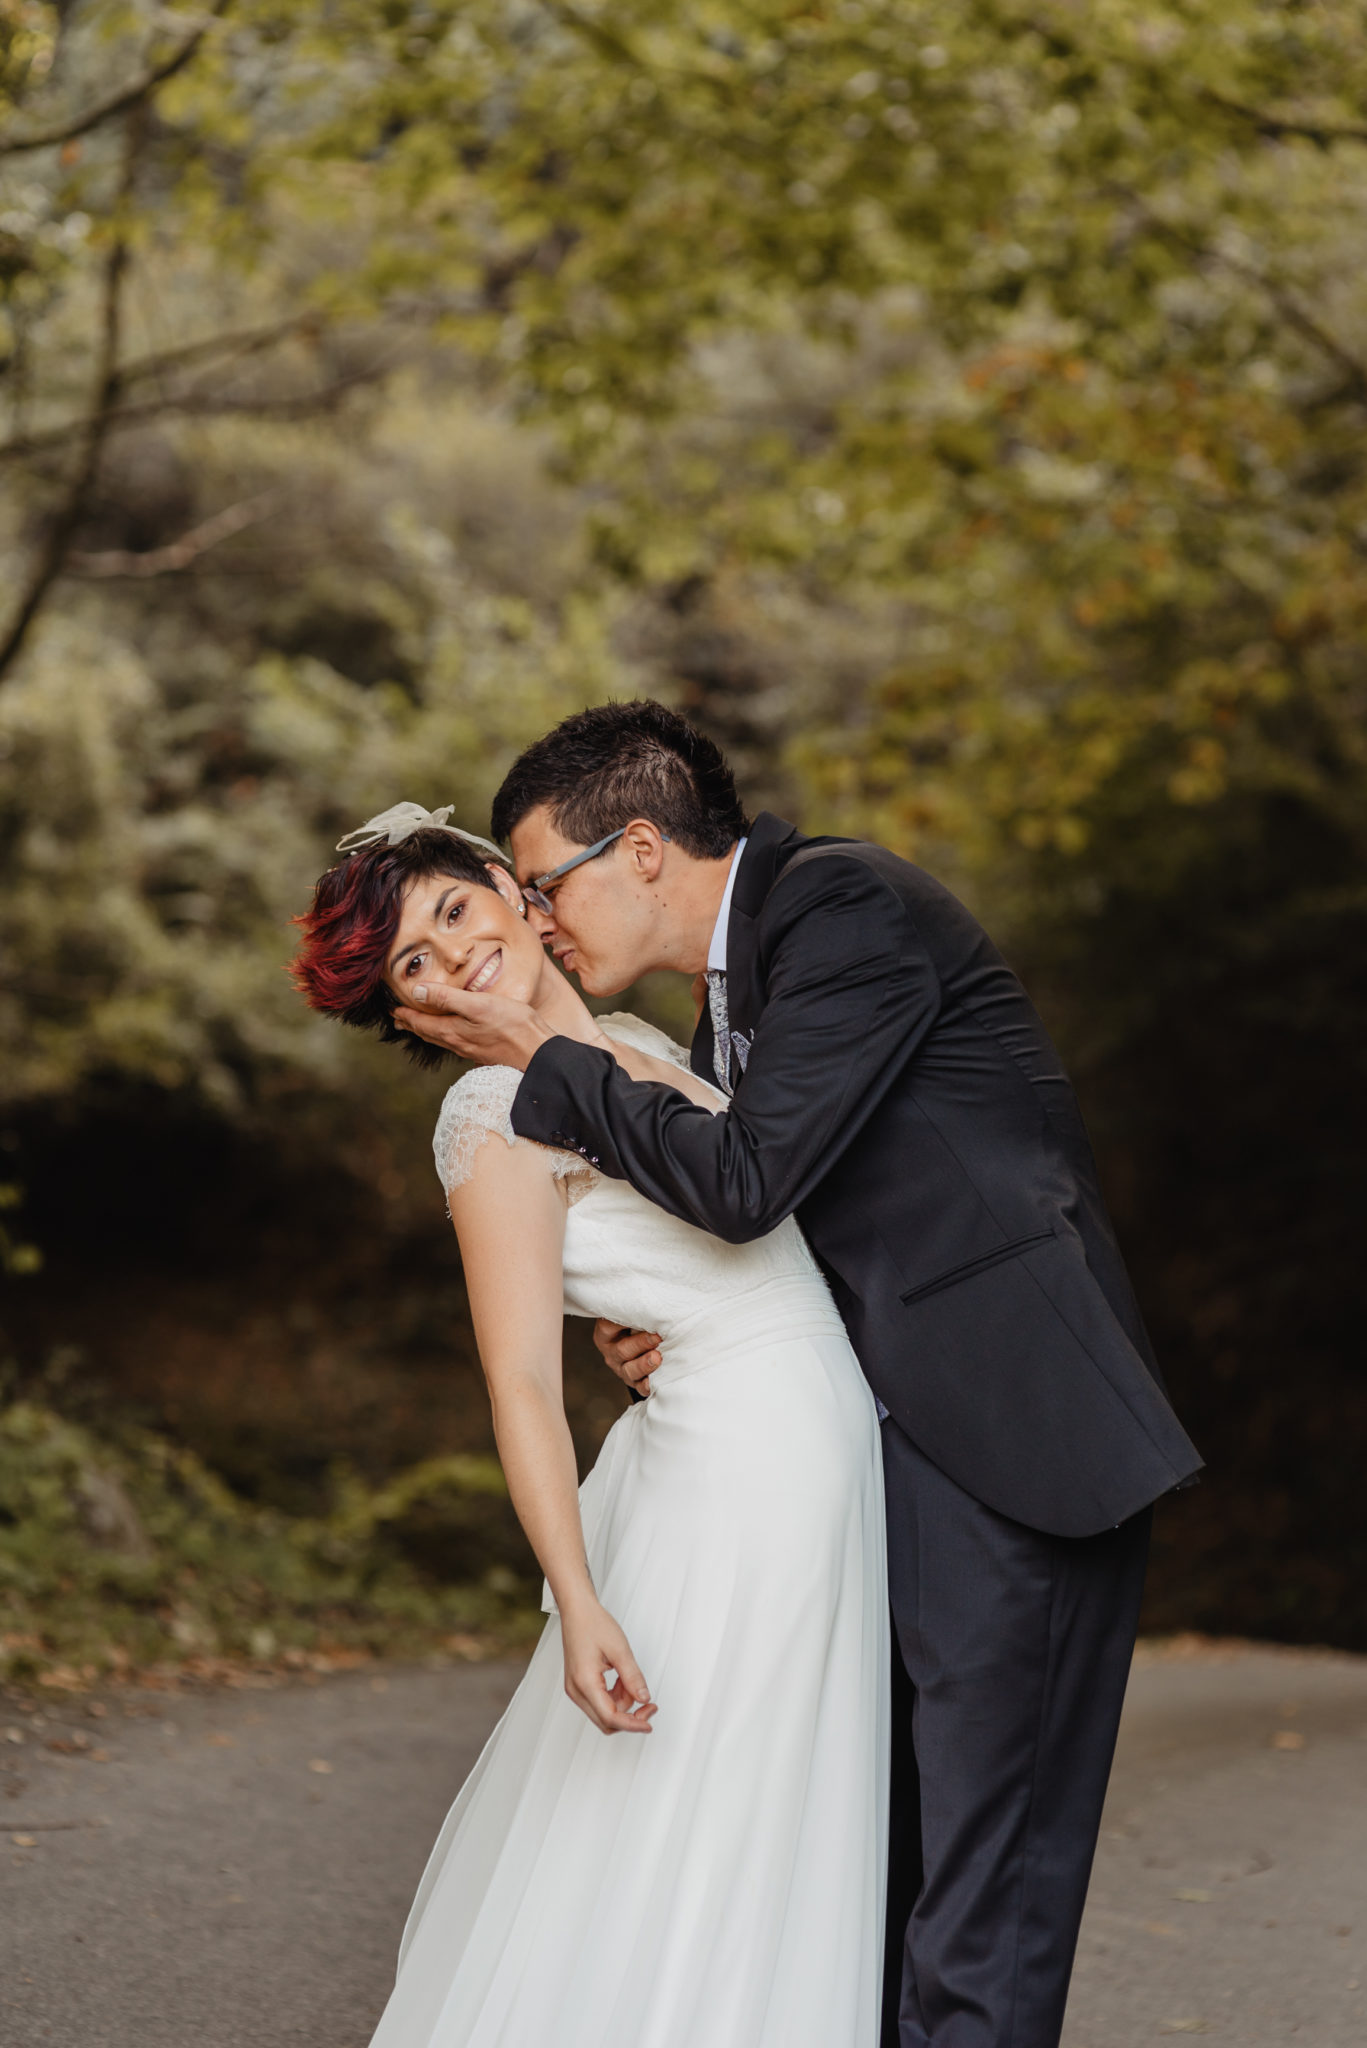 sesion-fotos-parejas-bodas-fotografo-reportaje-donosti-gipuzkoa-san-sebastian-meagas